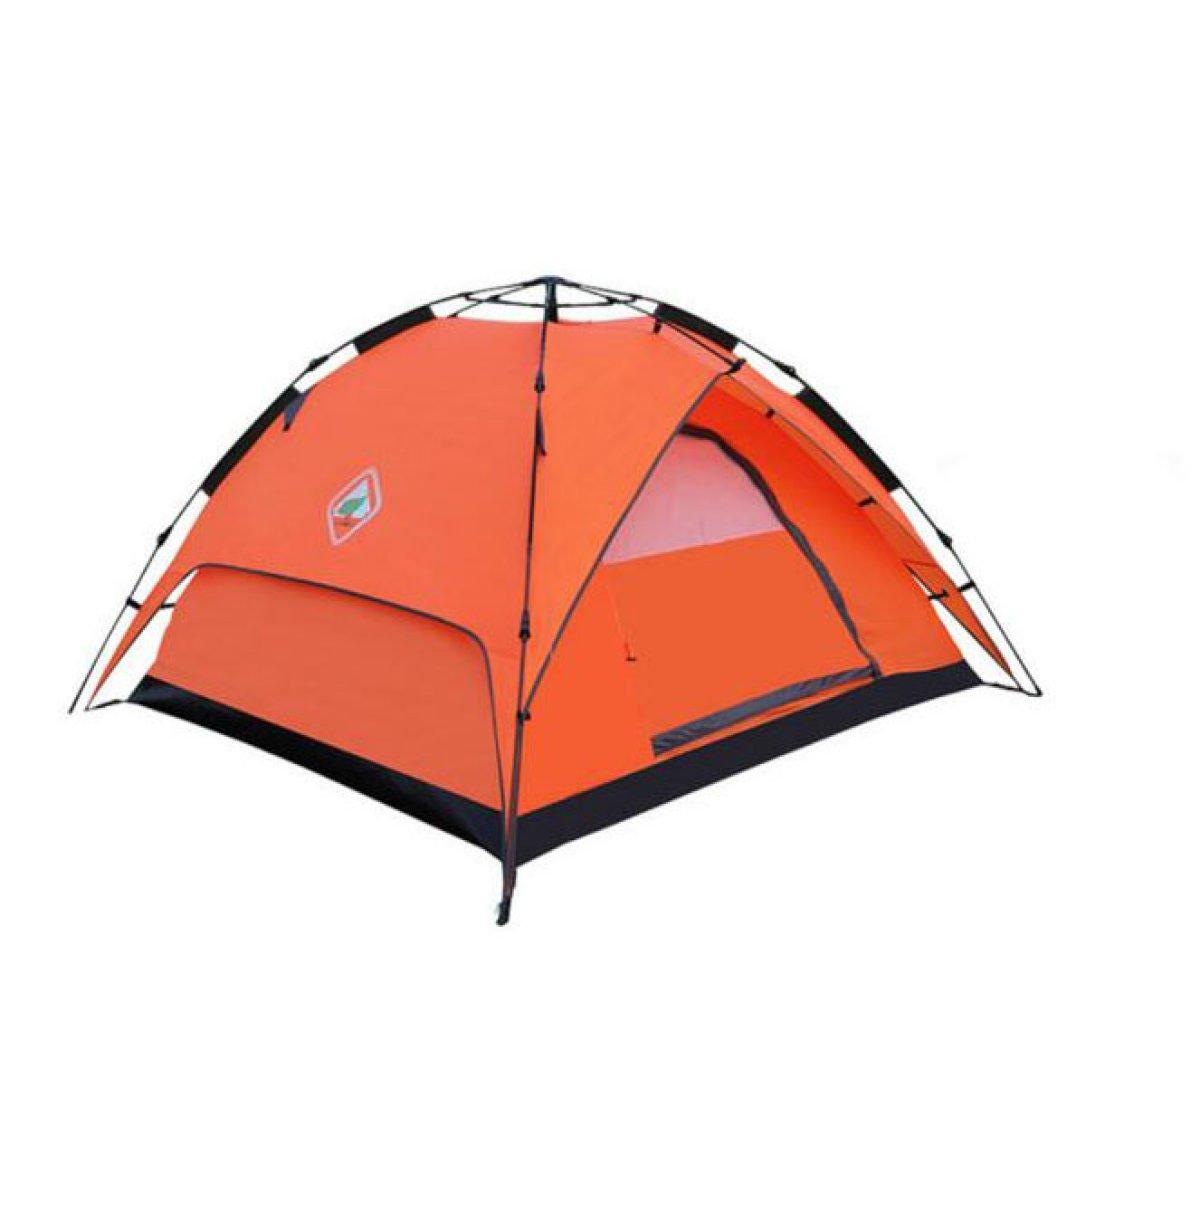 BFMEI Outdoor Automatik Doppel- Wind Regen Camping Zelt,OrangeHydraulic2WithAccount-230210130